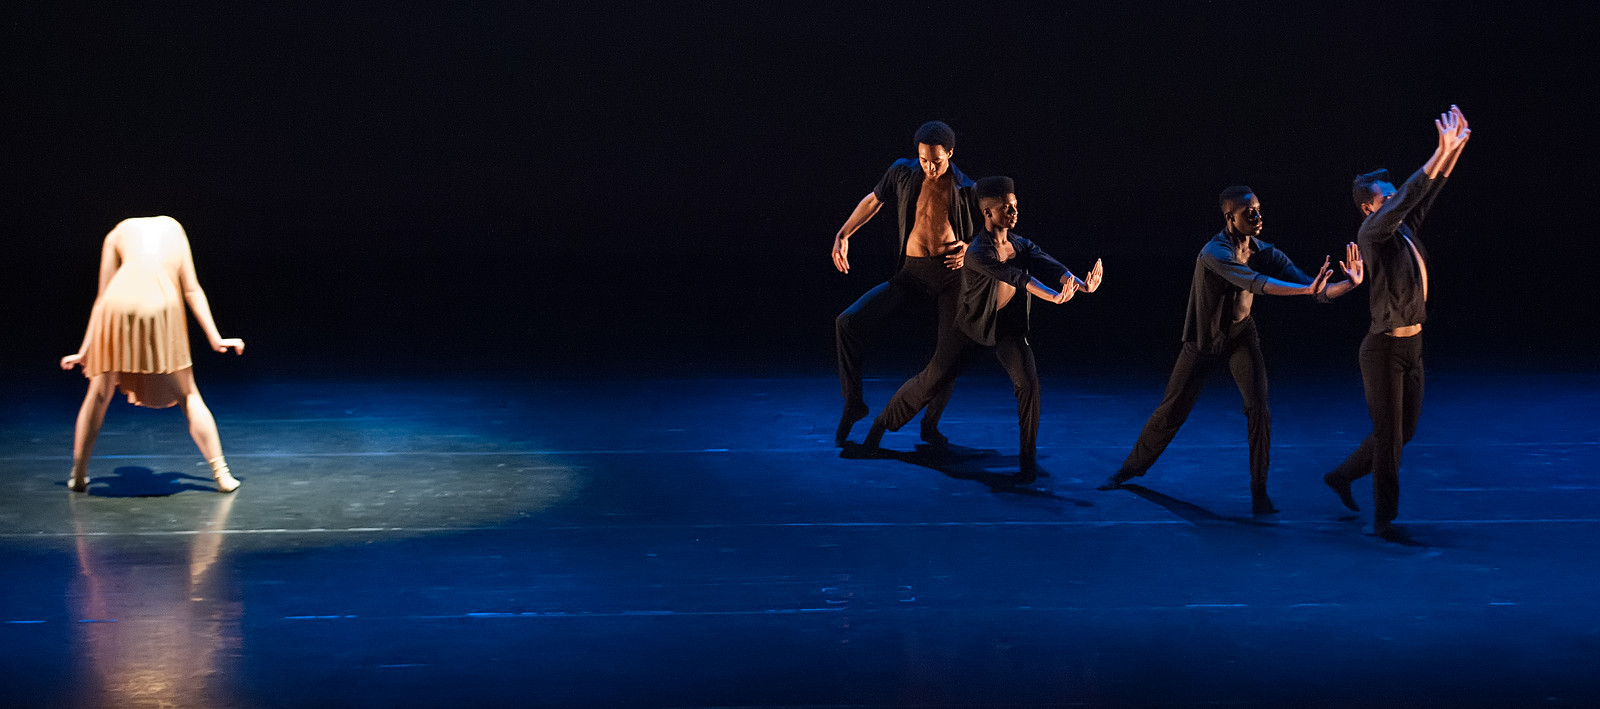 LaGuardia Graduation Dance Friday Performance 2014 Folder 2-603-X3.jpg